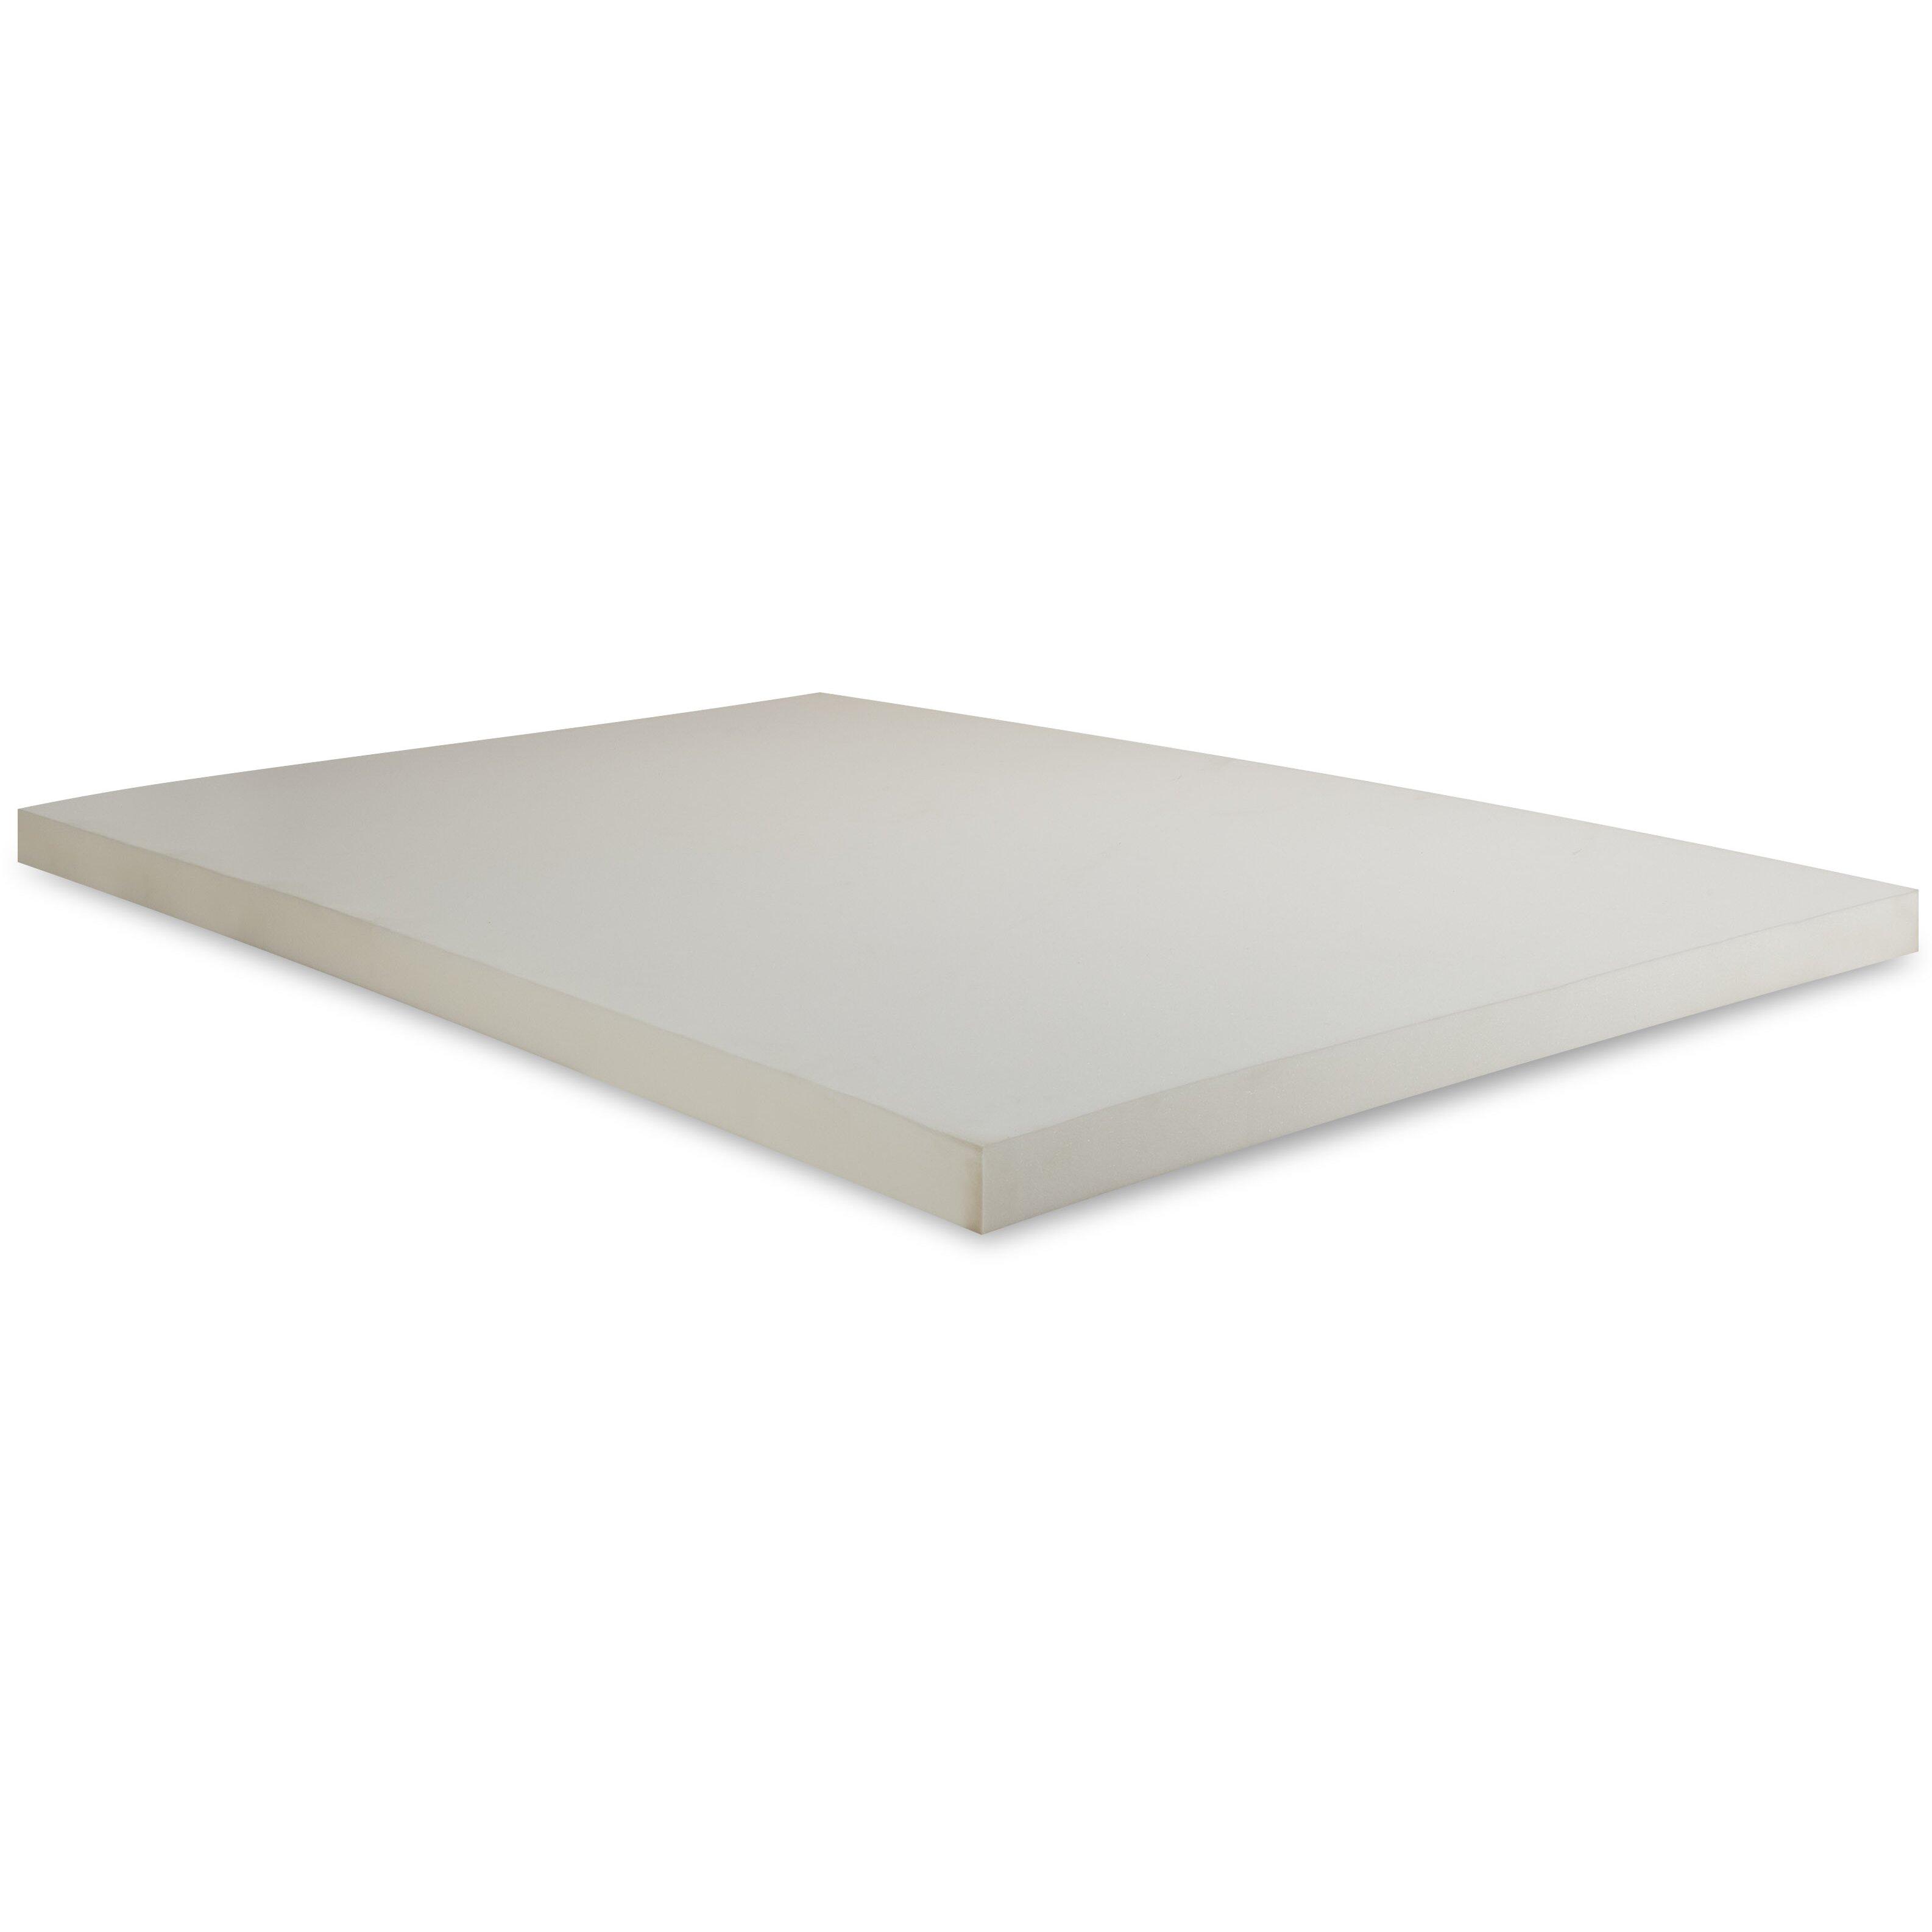 Independent Sleep Twin XL Slab Memory Foam Topper